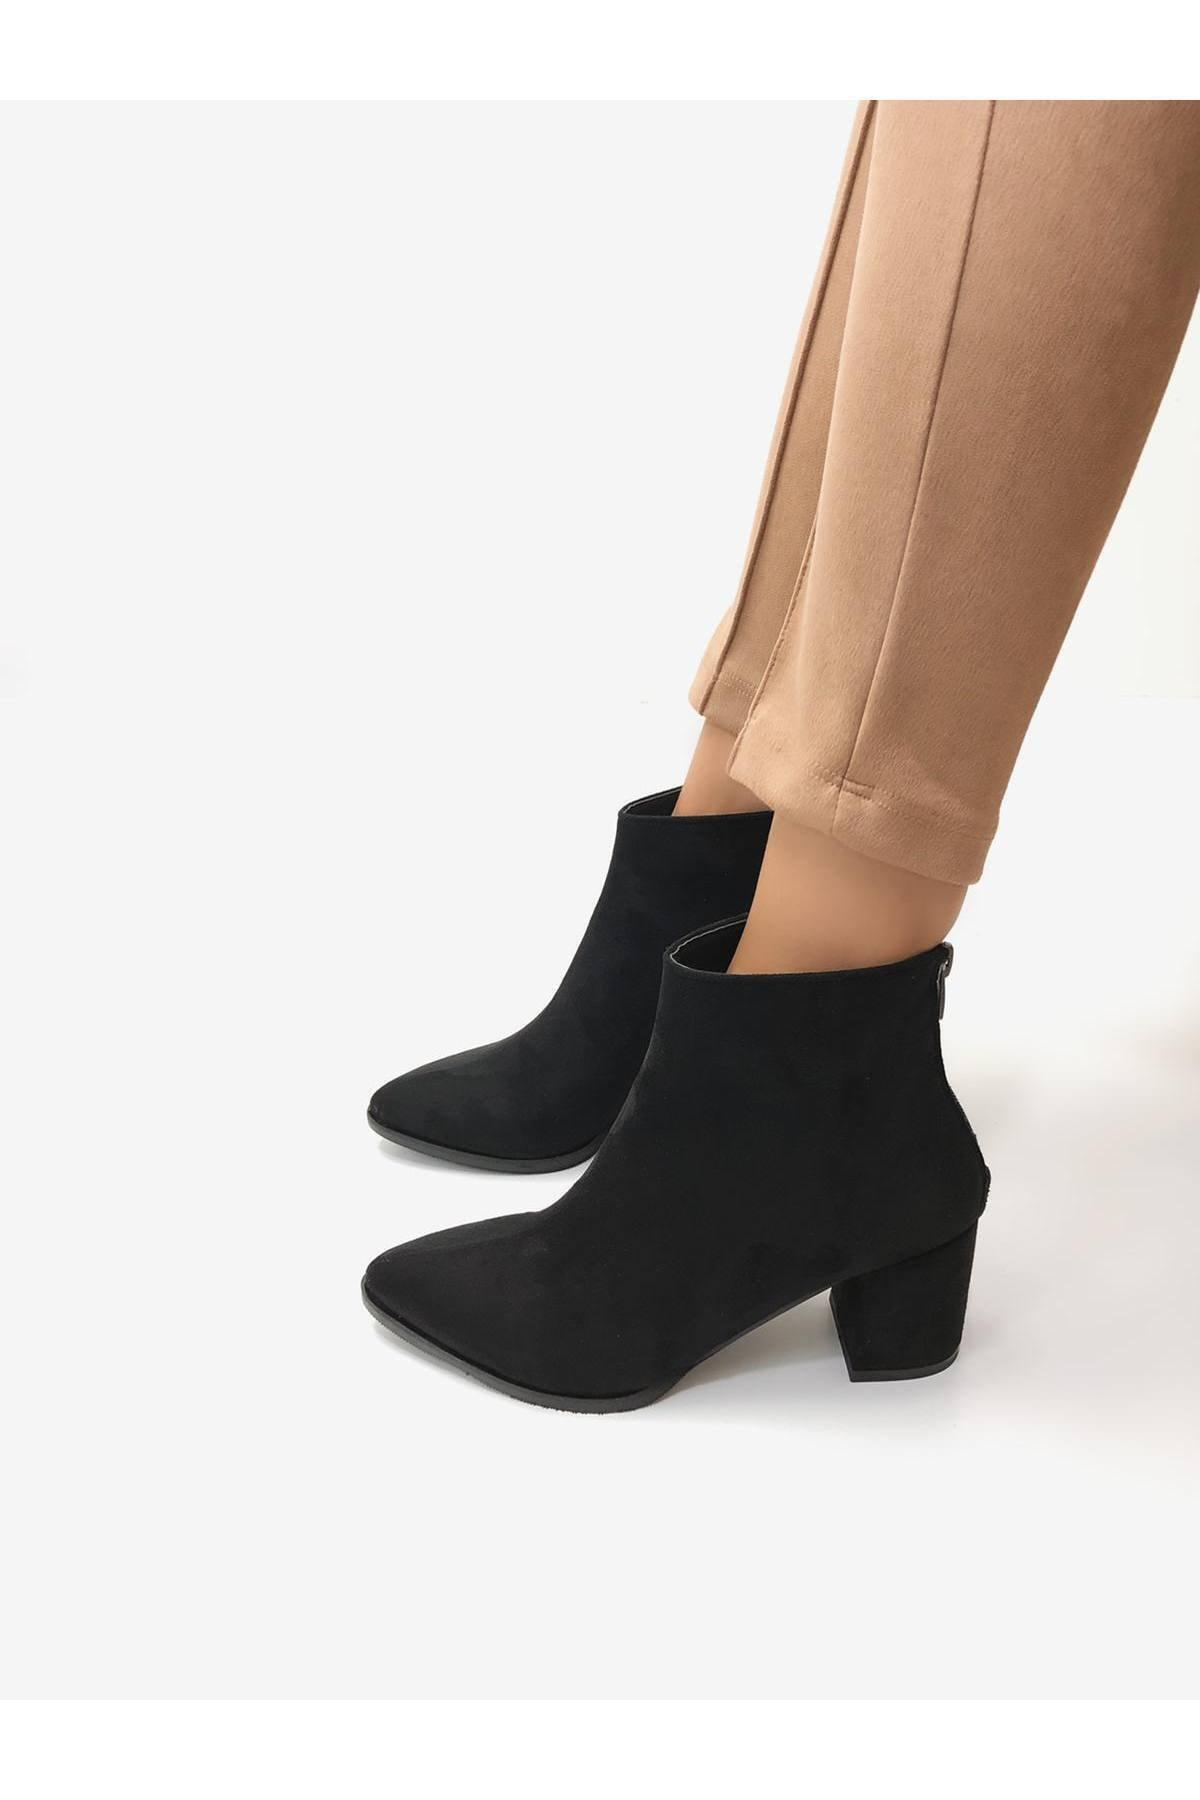 BasmakShoes Kadın Siyah Süet Topuklu Bot 1